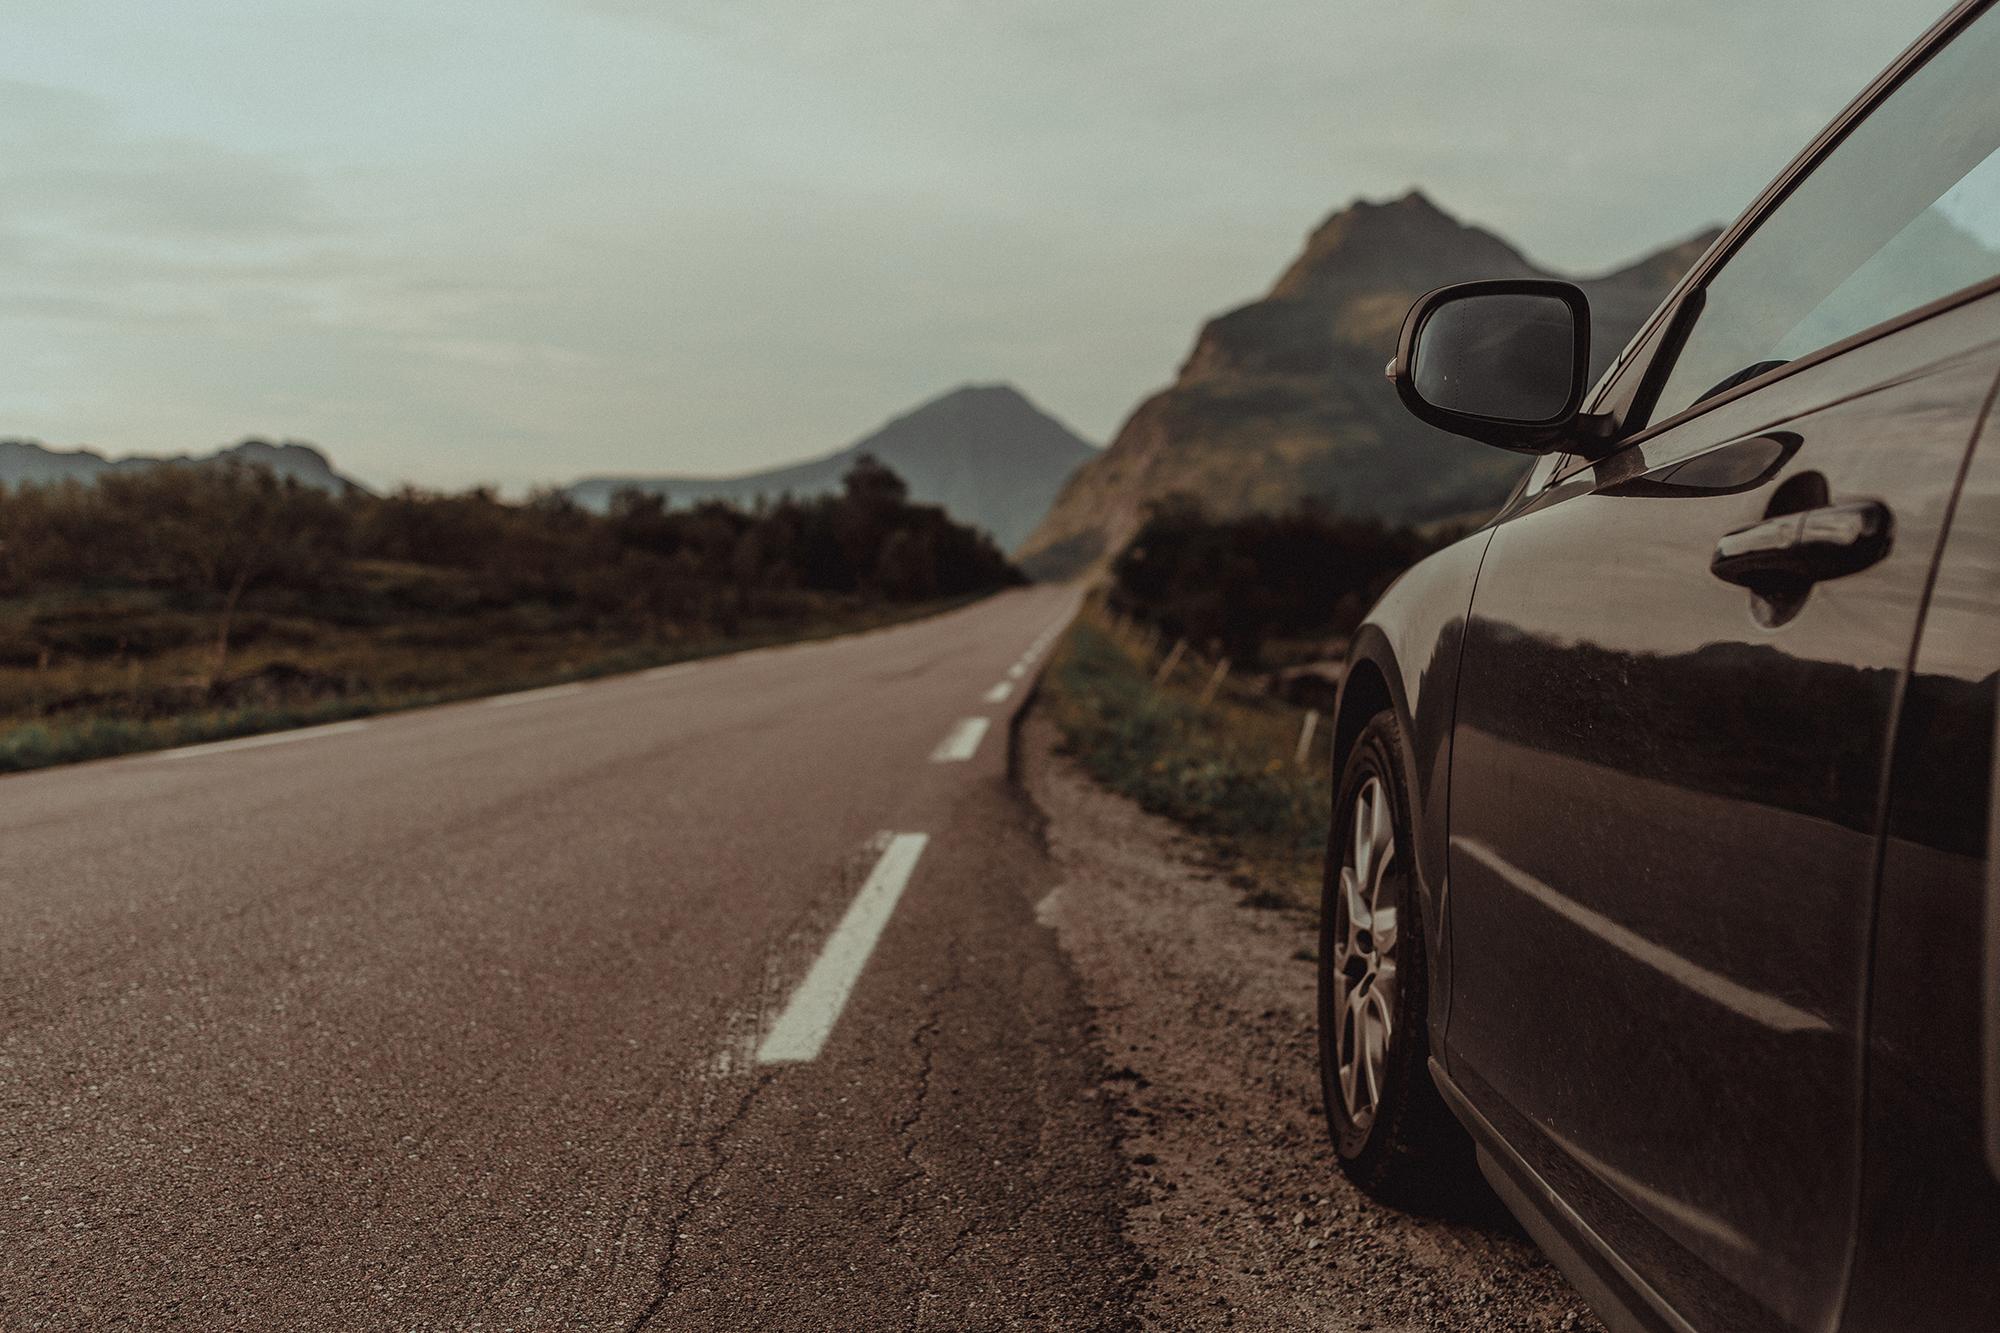 I loooove road trips!